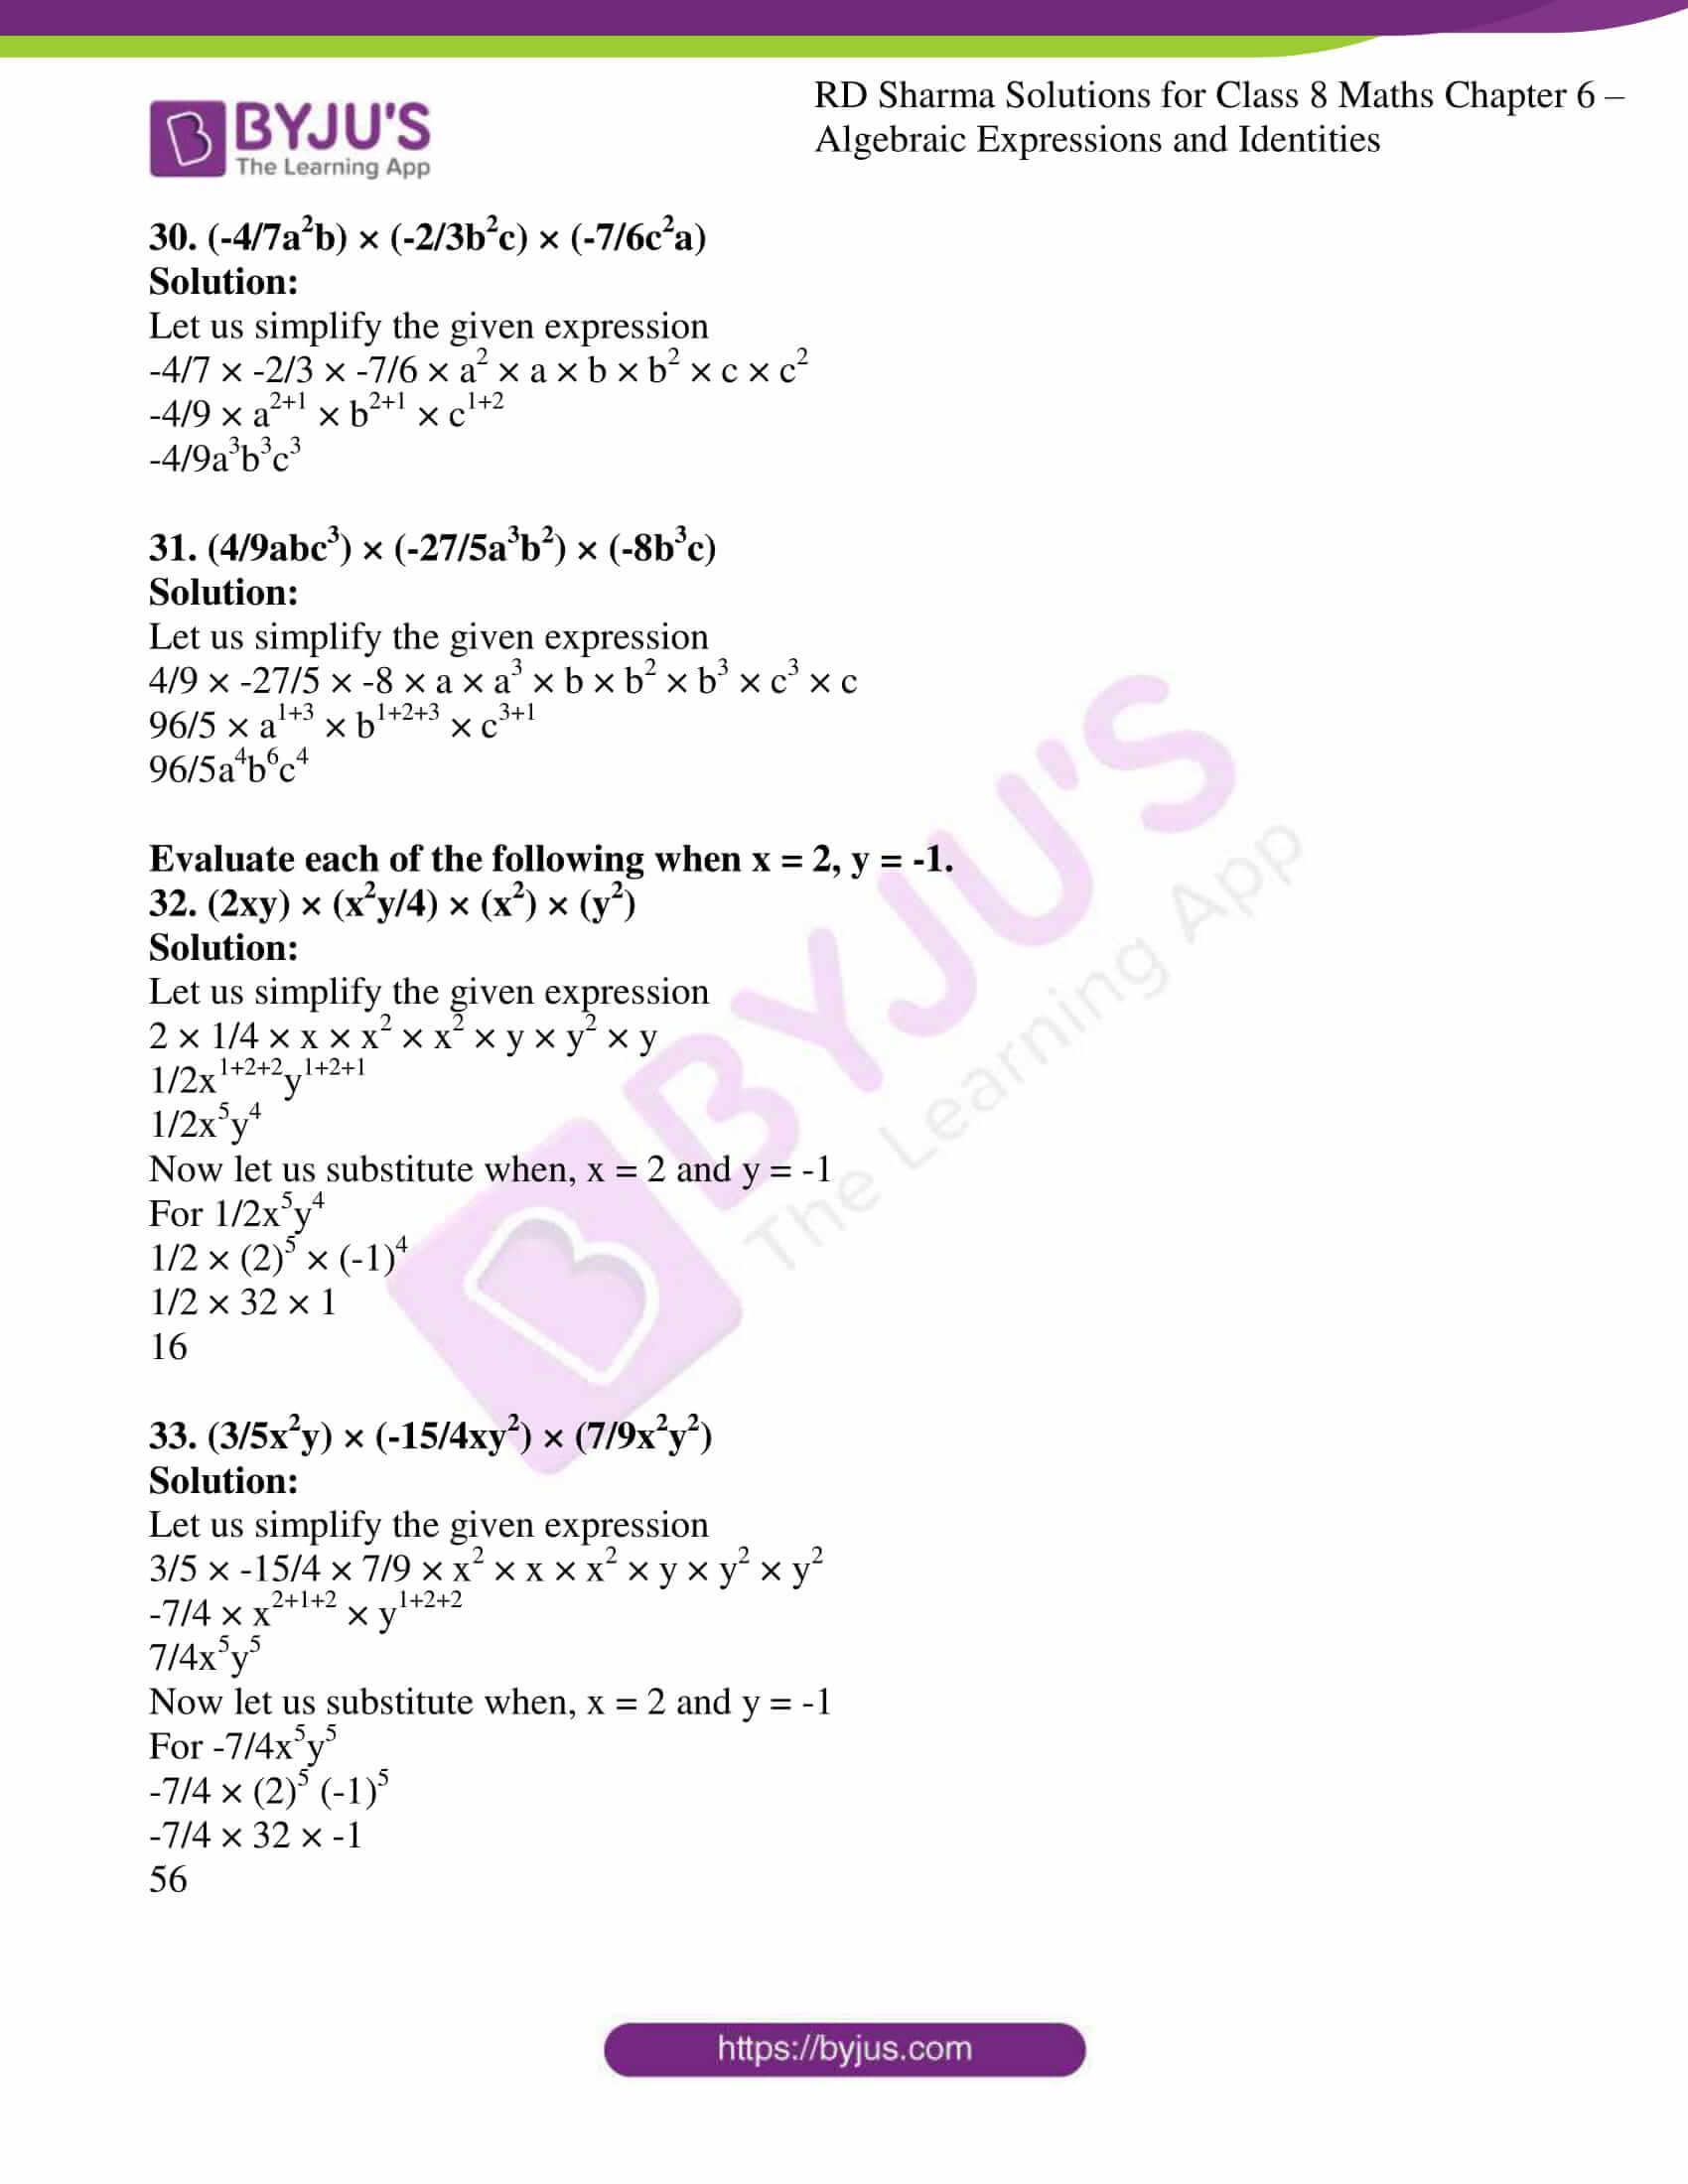 rd sharma class 8 maths chapter 6 exercise 3 8